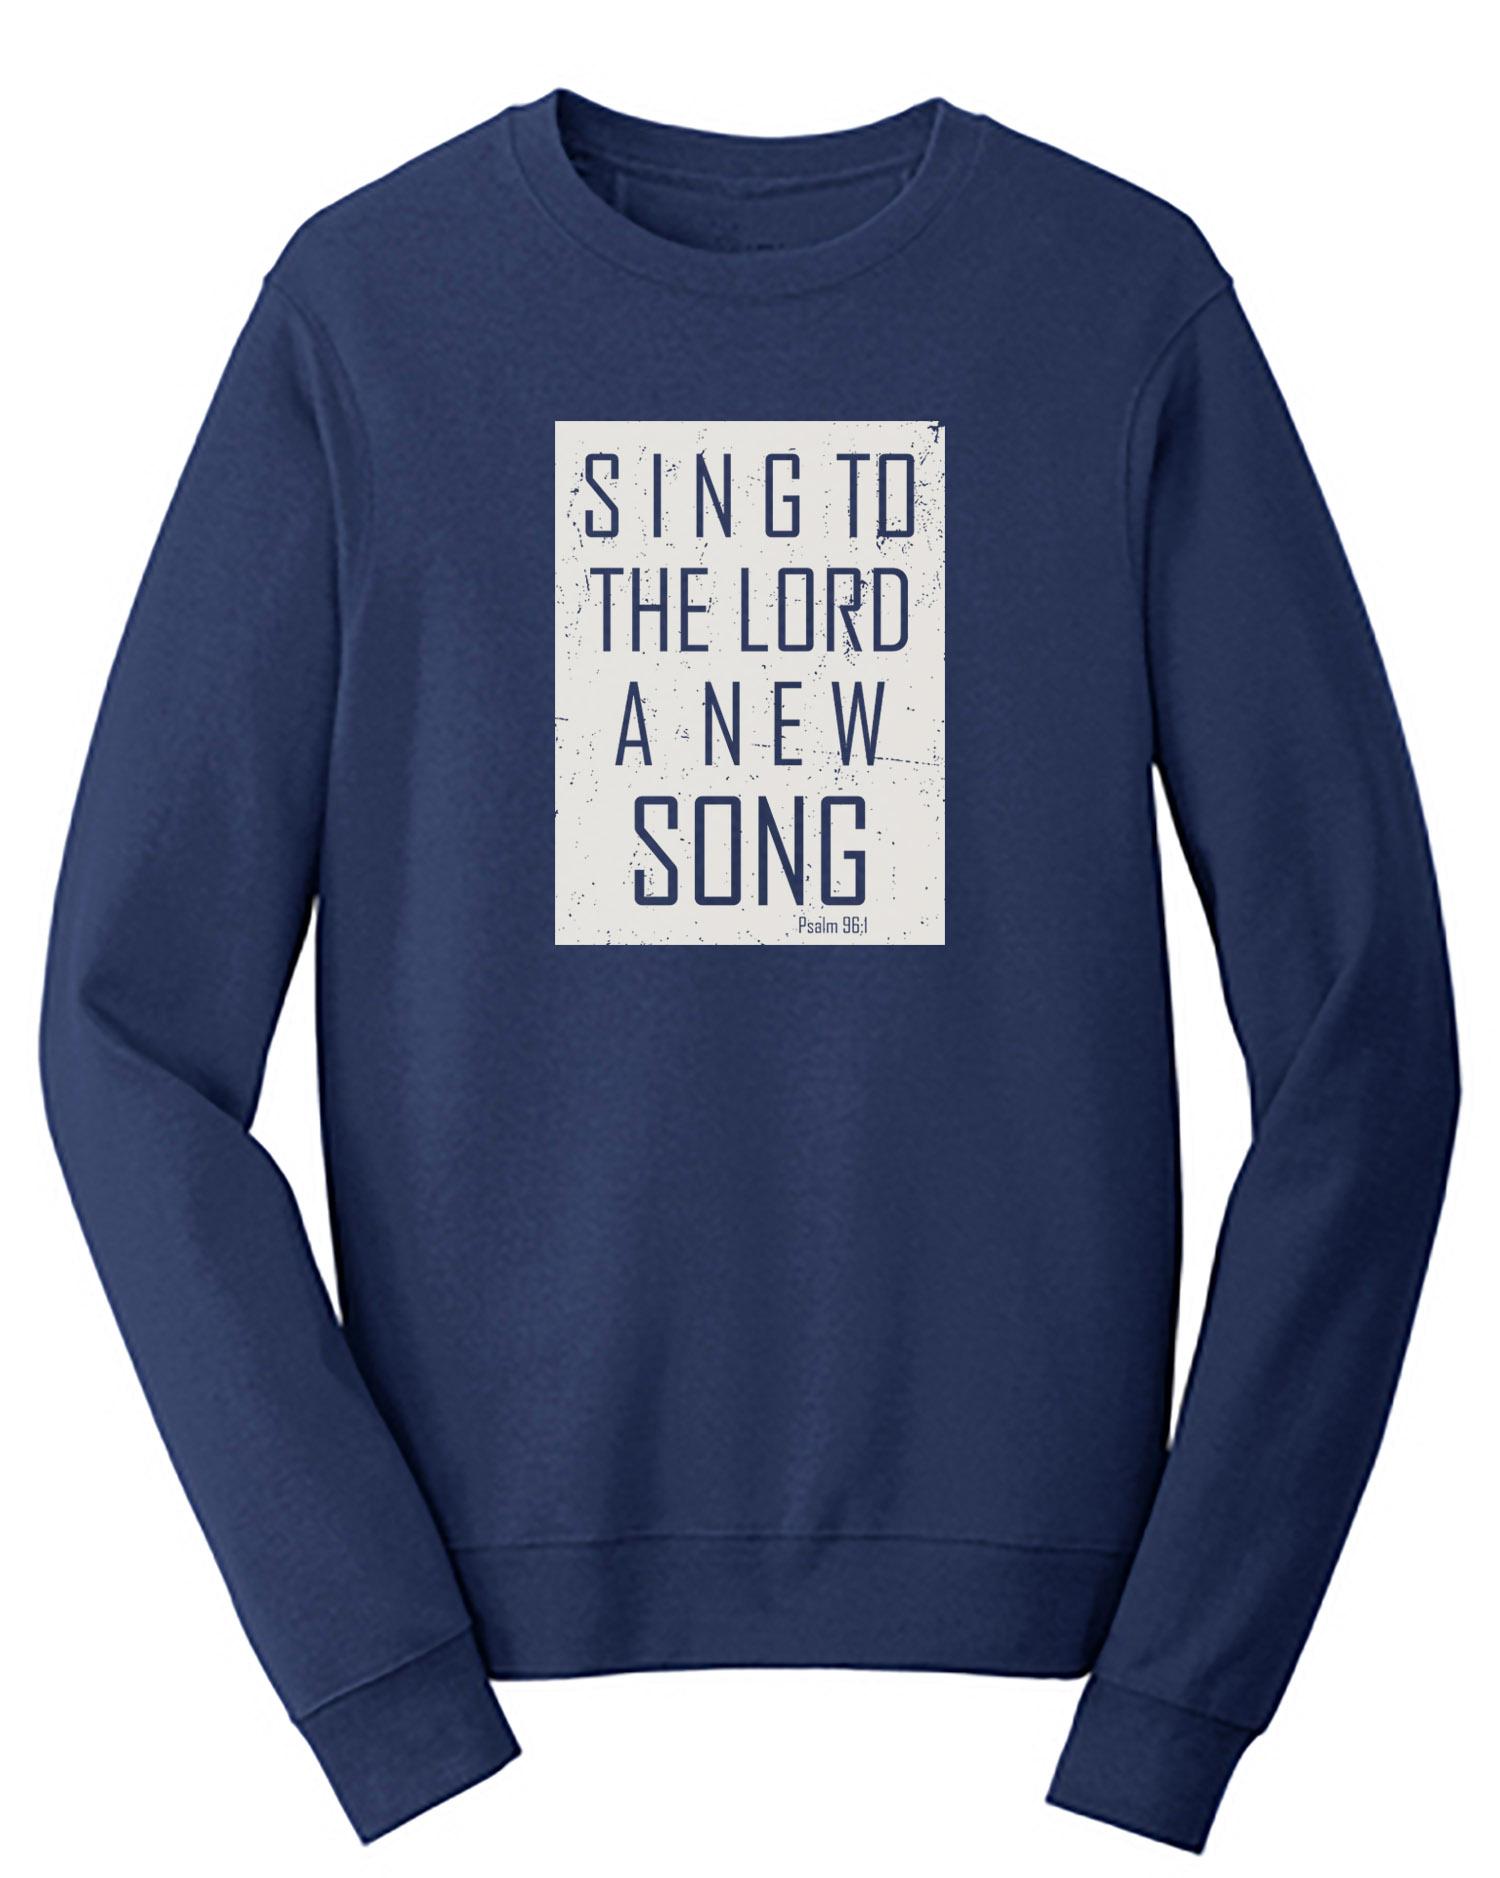 A New Song Sweatshirt